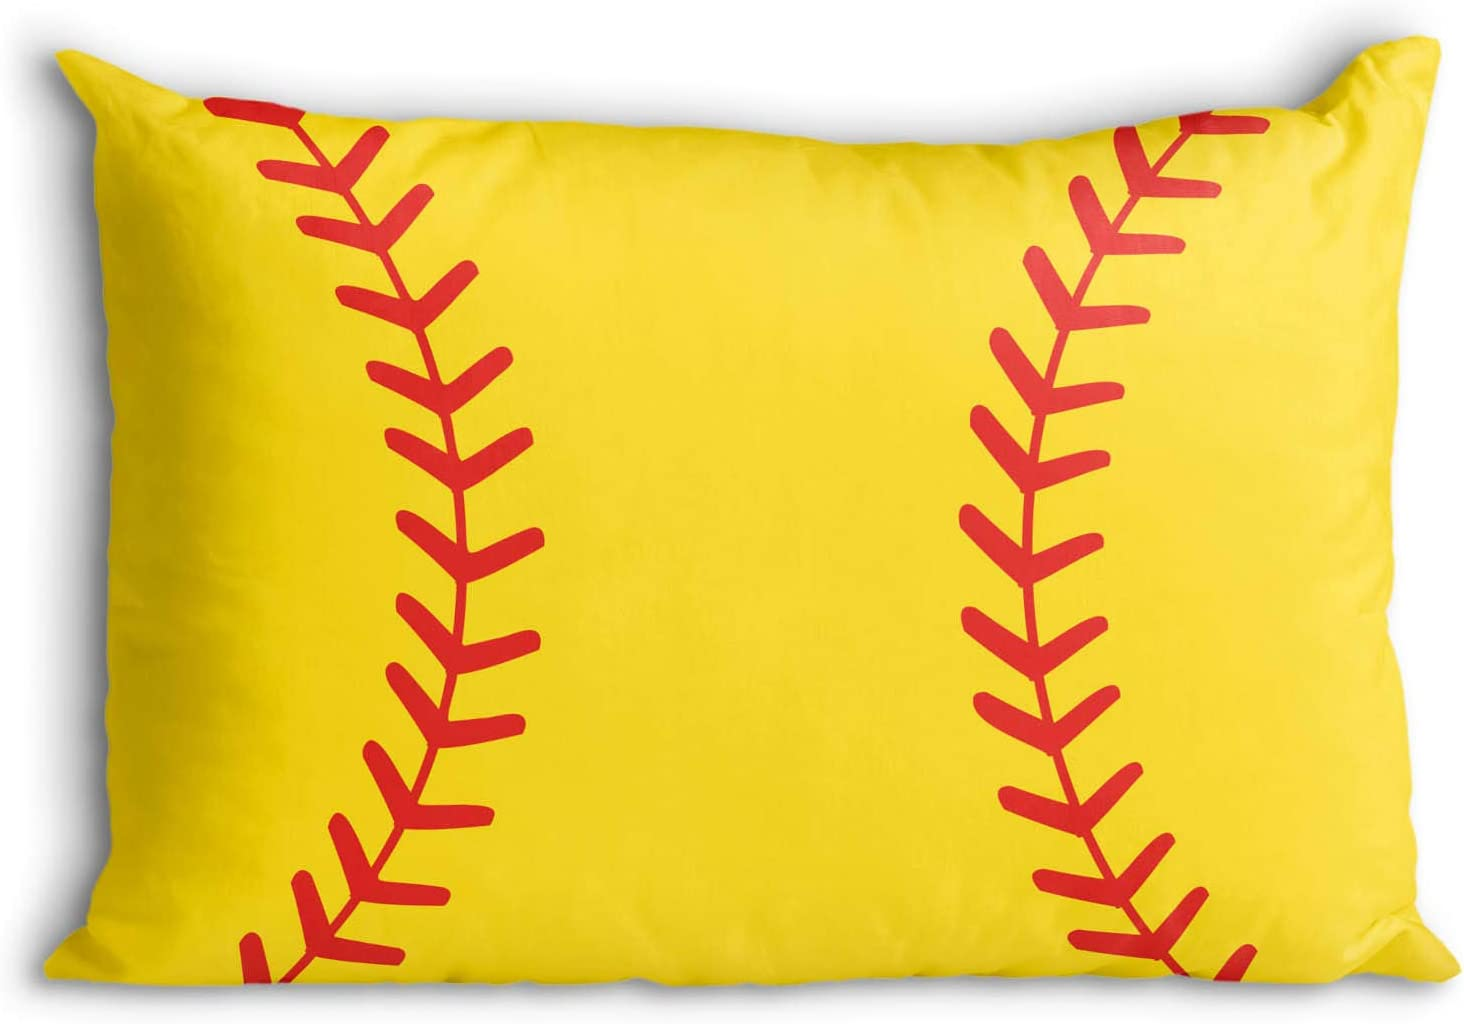 Close Up Stitches Pillowcase | Softball Pillows by ChalkTalk Sports